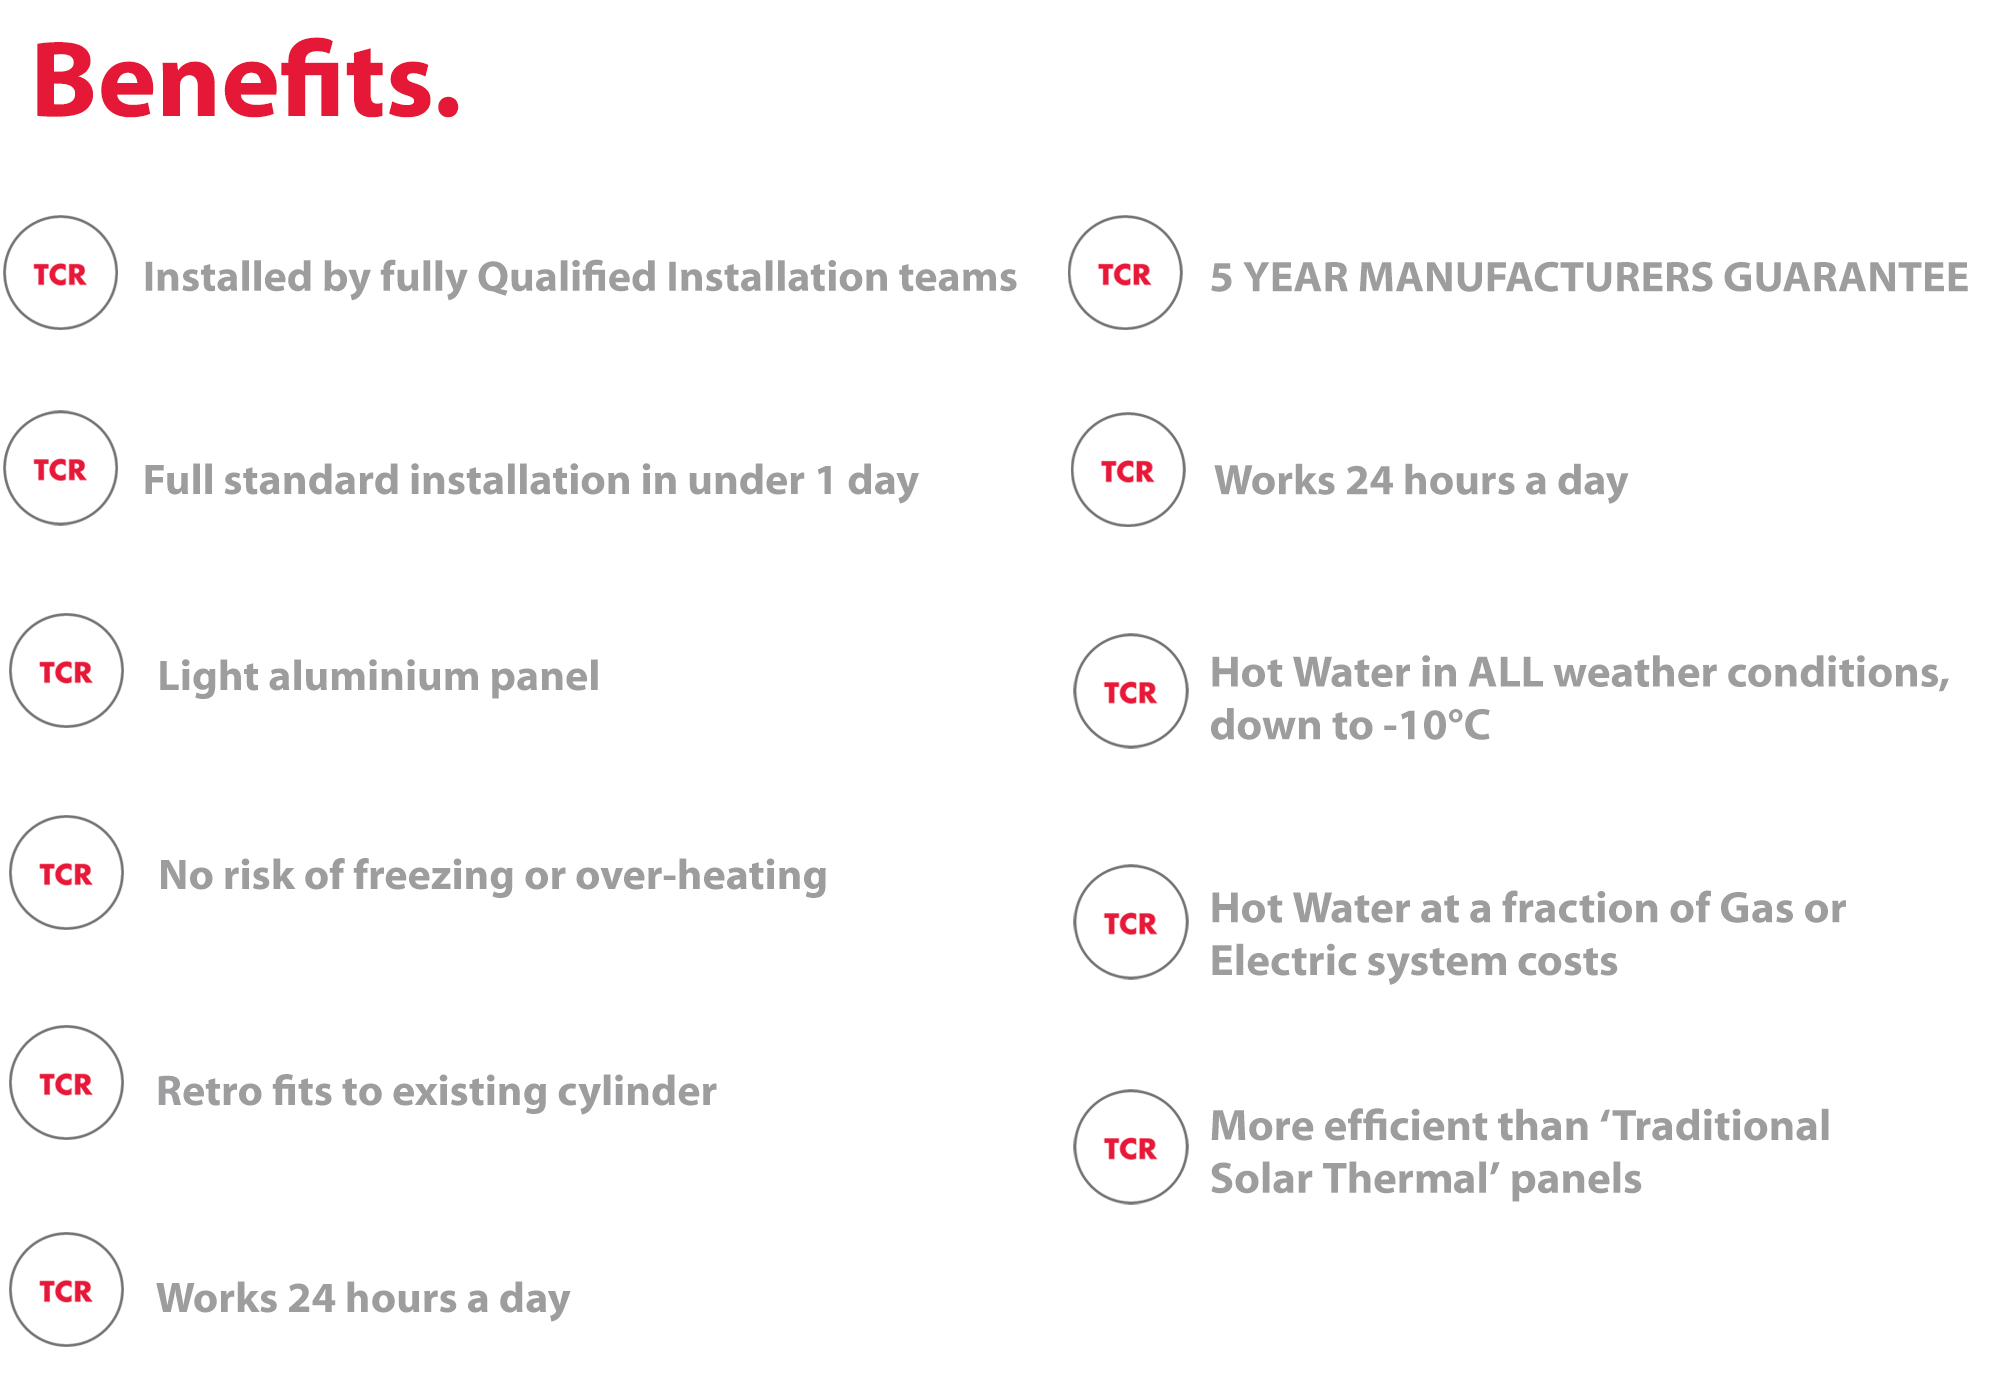 Benefits of Solar Thermodynamics